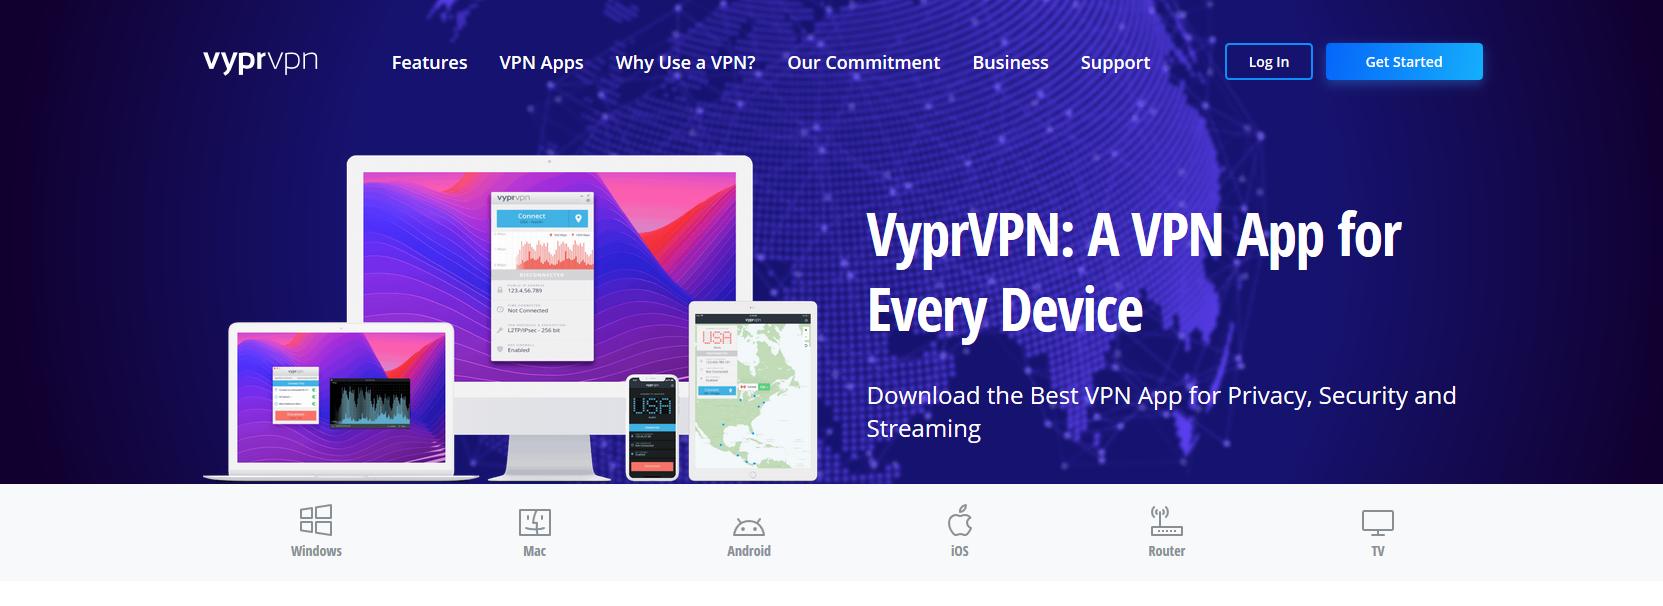 Download VyprVPN App For Every Device